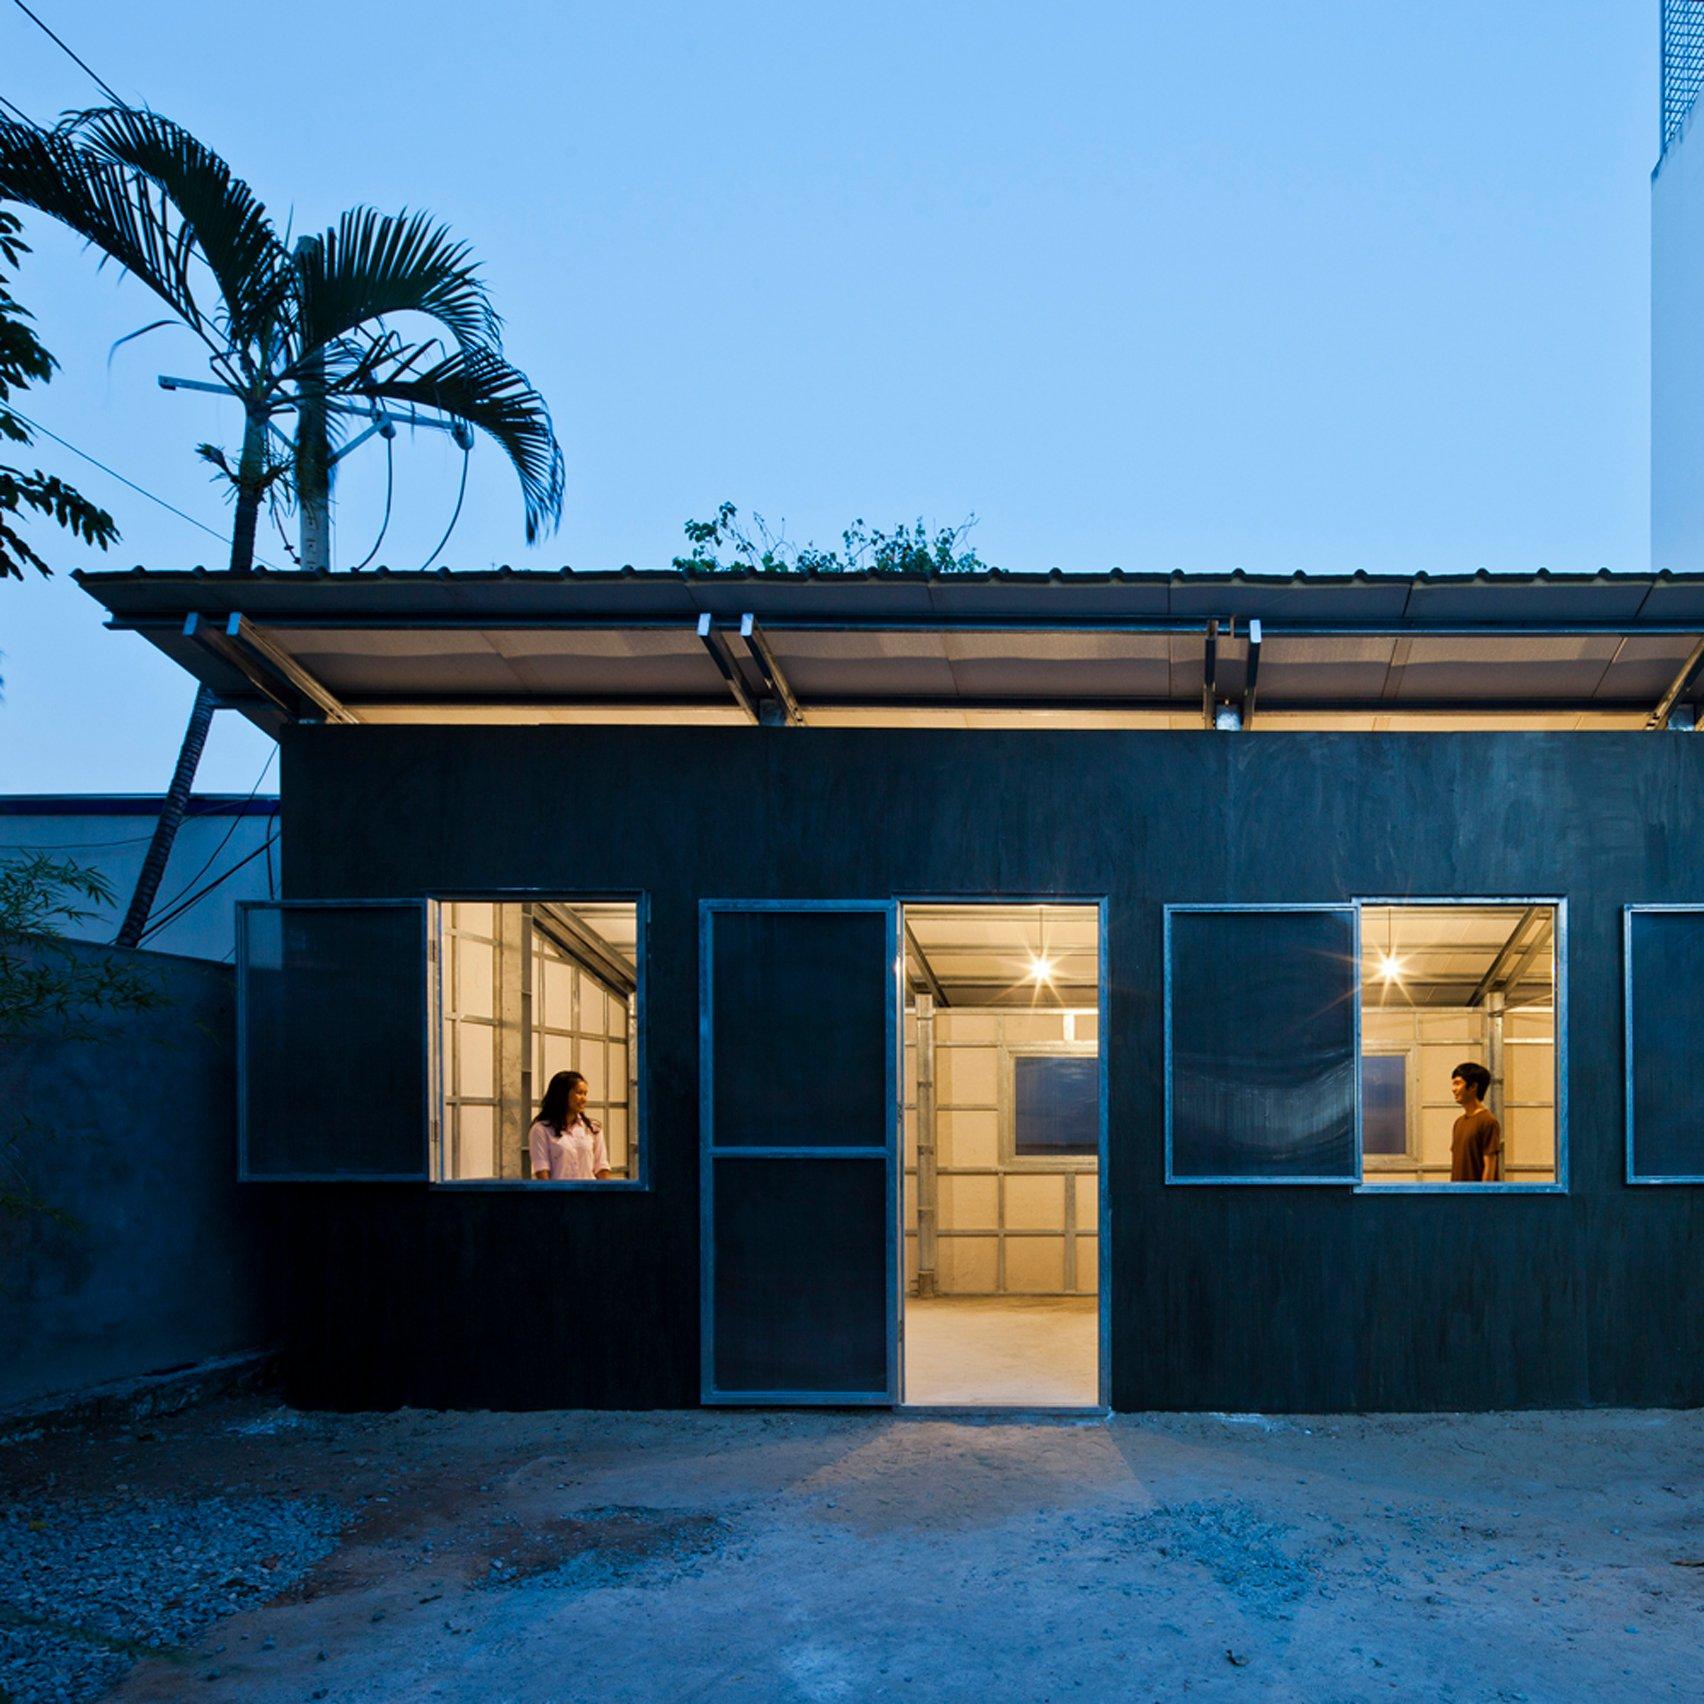 s-house-vo-trong-nhia-dezeen-low-cost-housing-sq-852x852.jpg